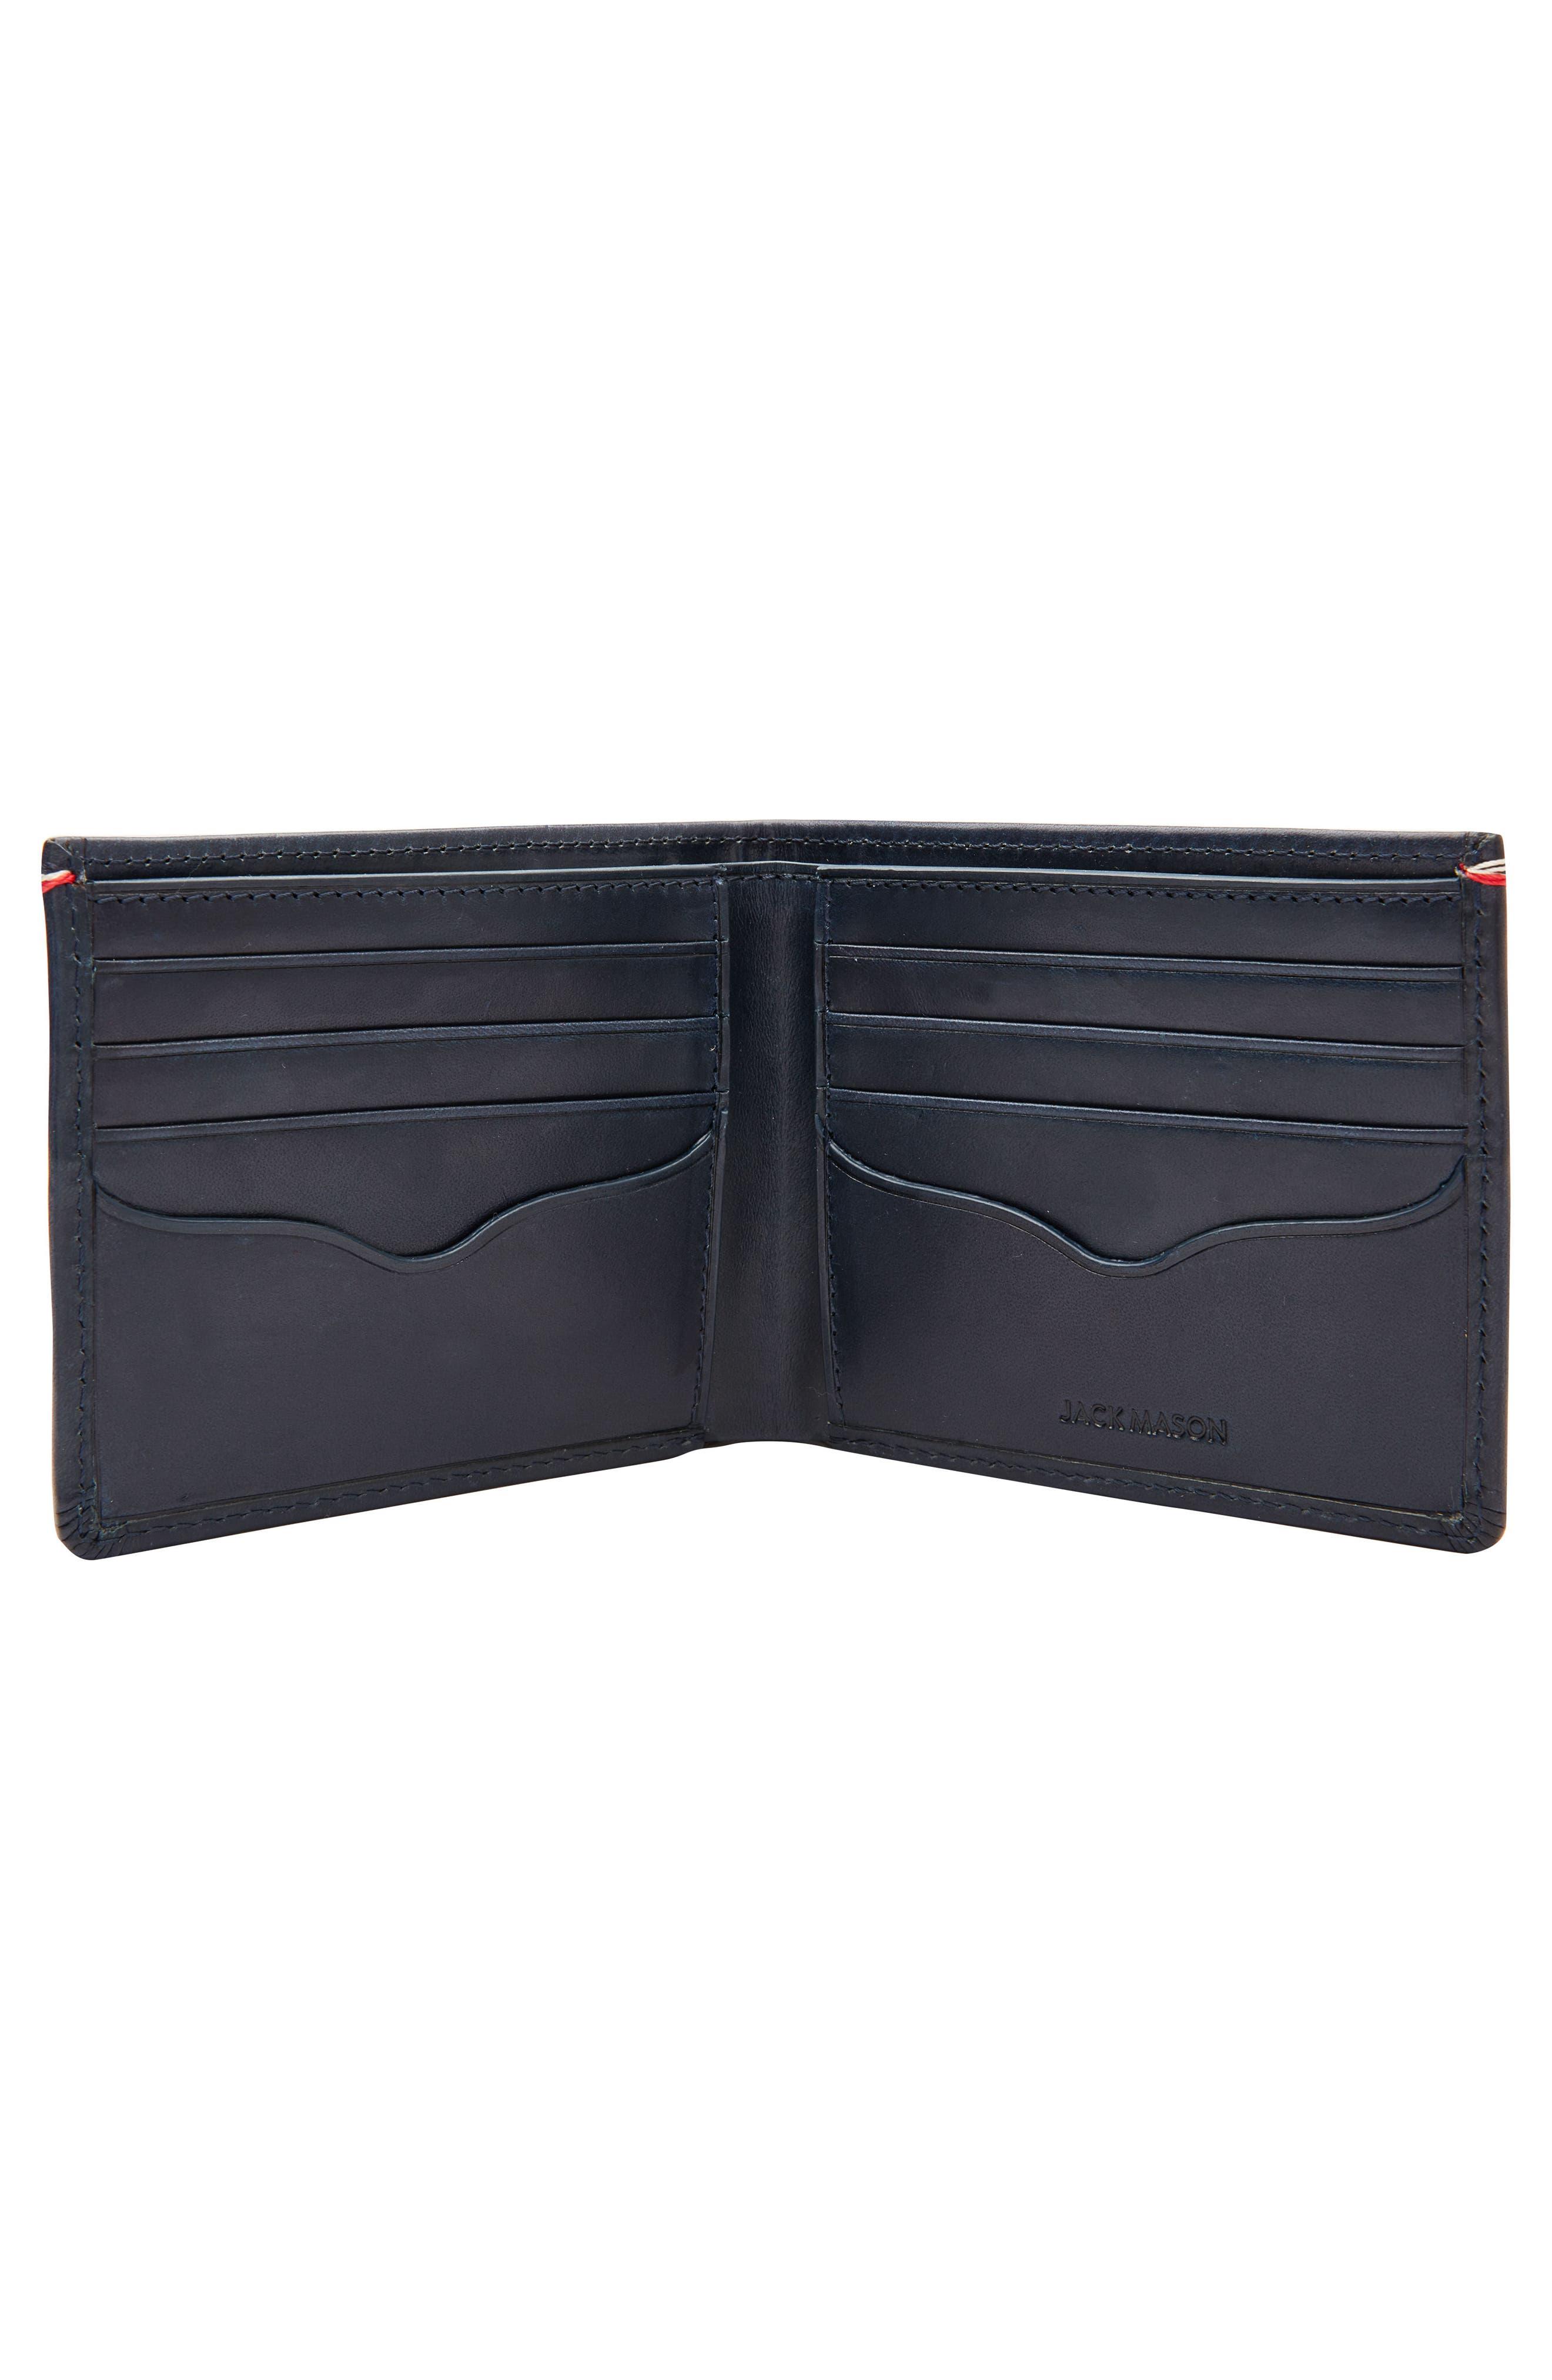 Core Leather Wallet,                             Alternate thumbnail 5, color,